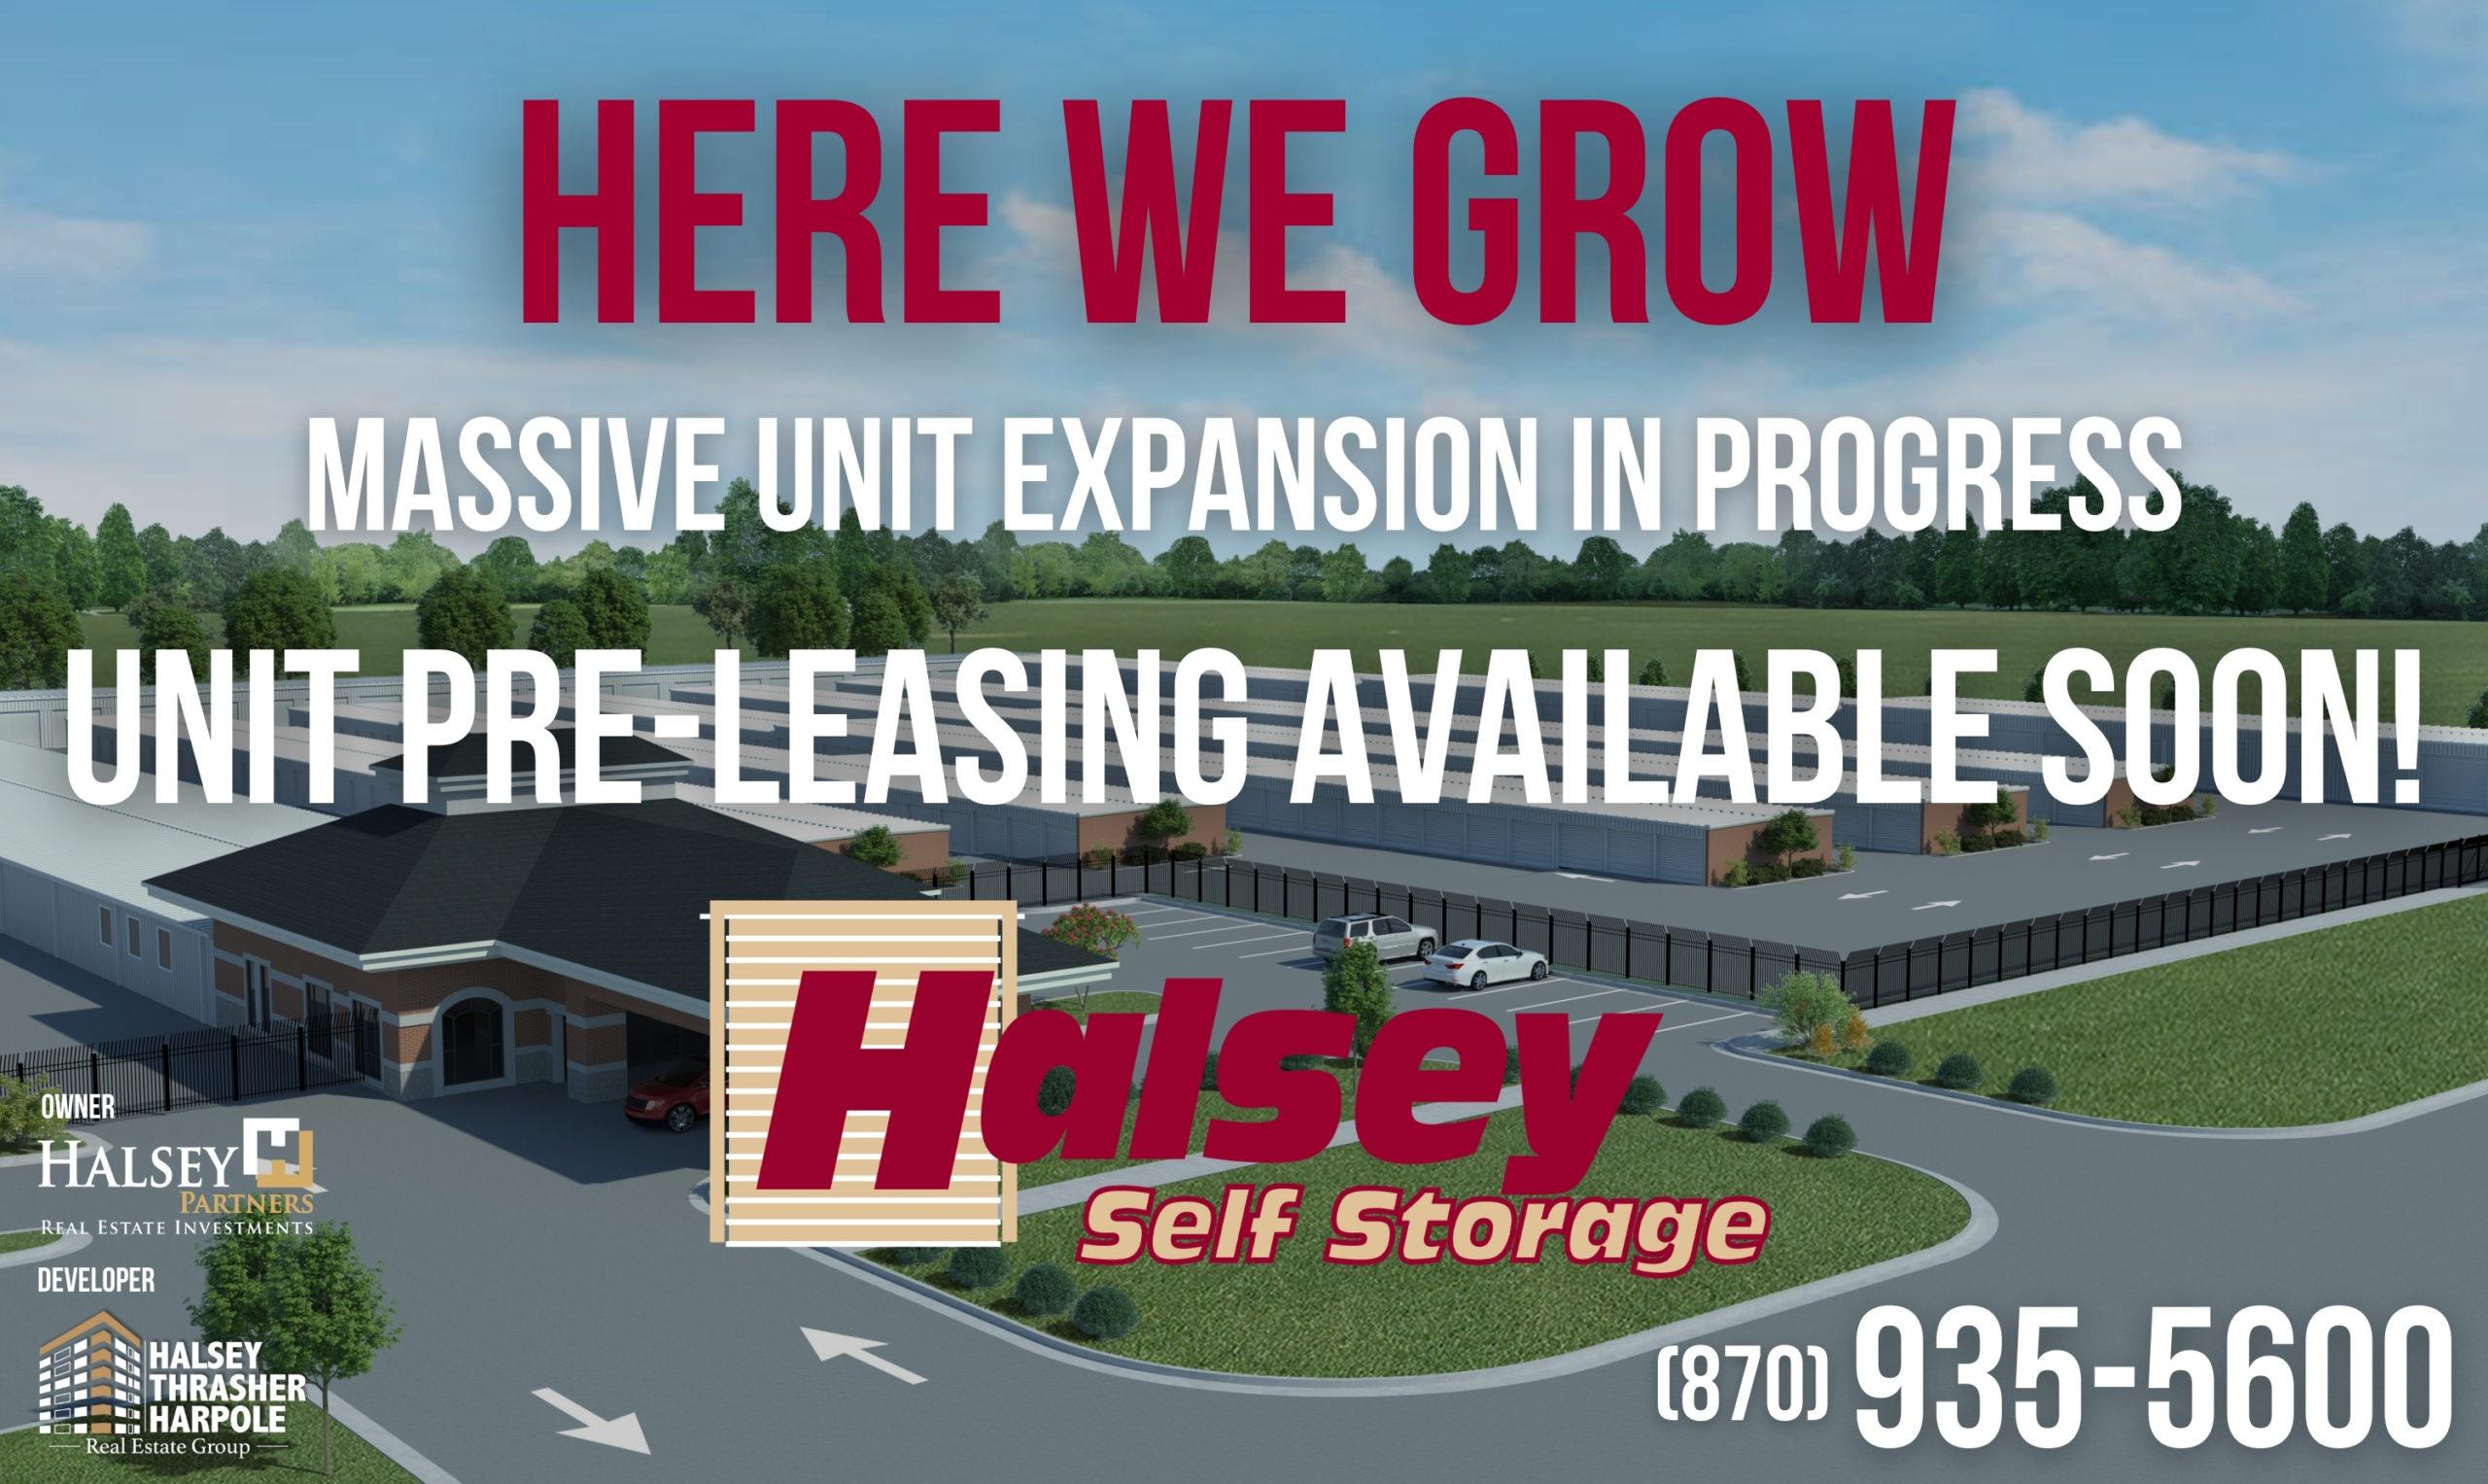 Halsey Self Storage Expansion 2020-2021